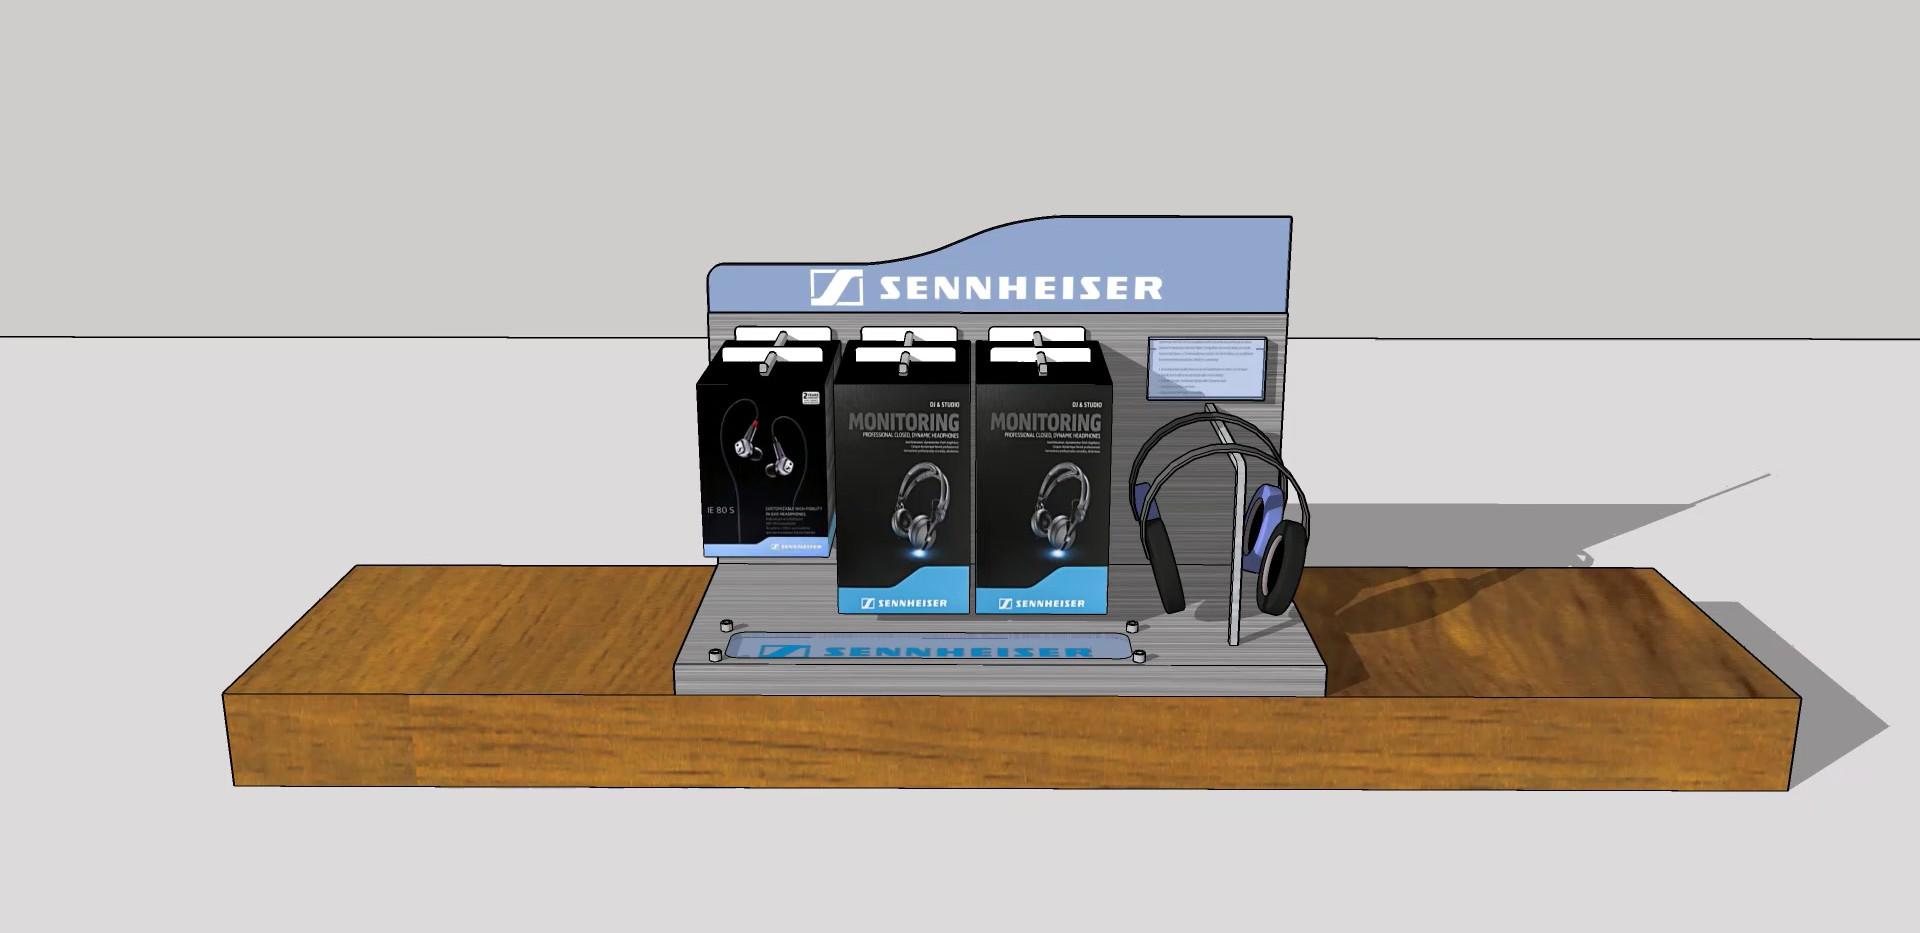 Senheiser Counter Display